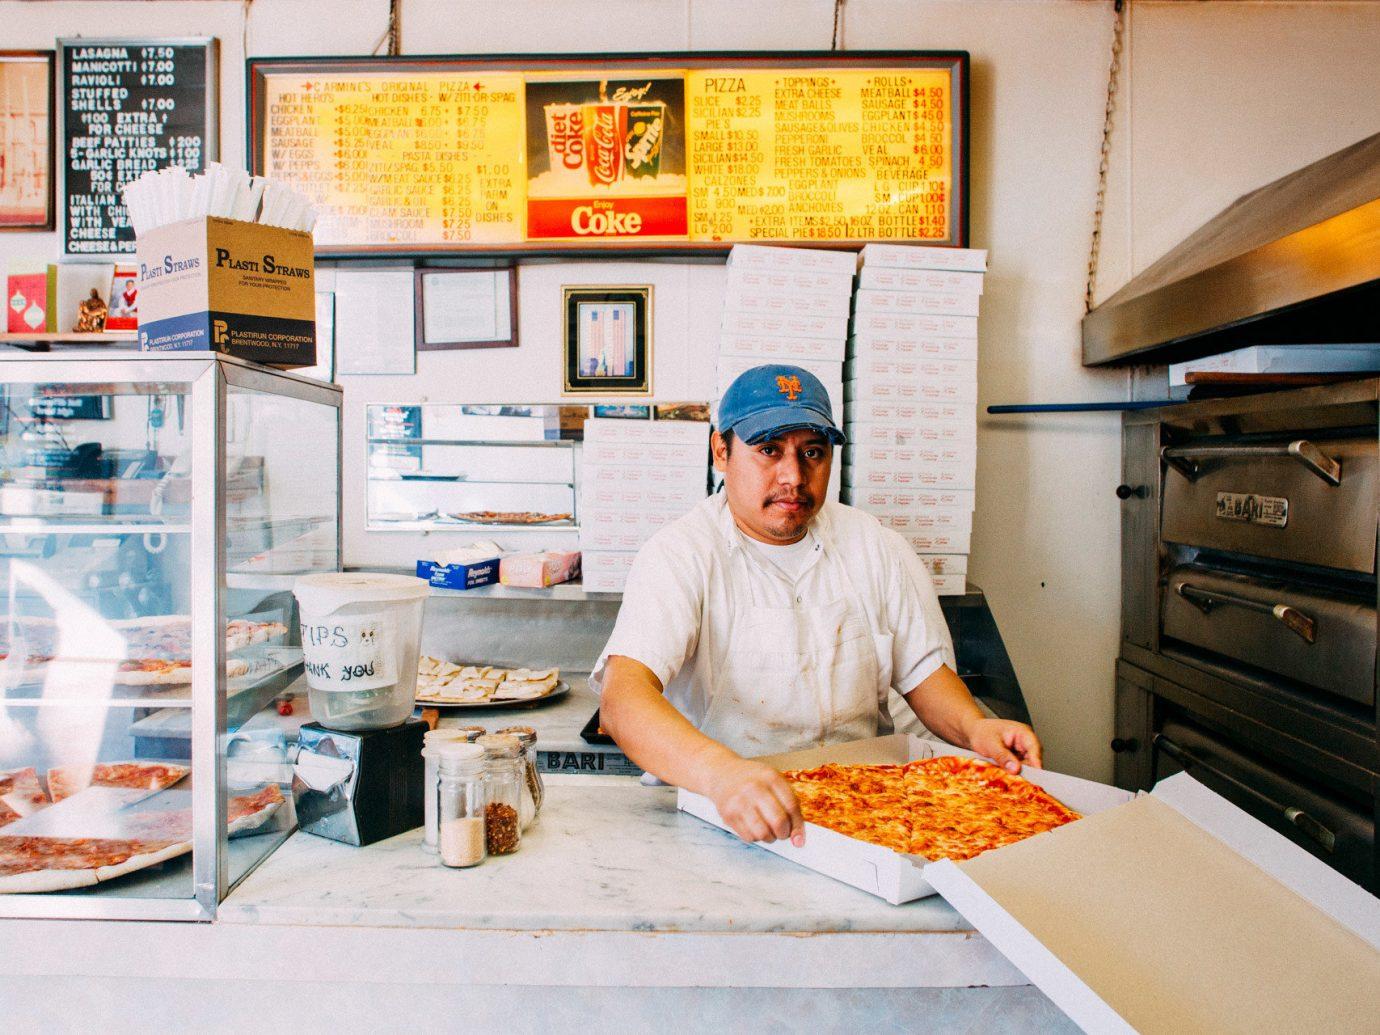 Food + Drink food person indoor bakery fast food dish cook cuisine restaurant sense baker fast food restaurant preparing